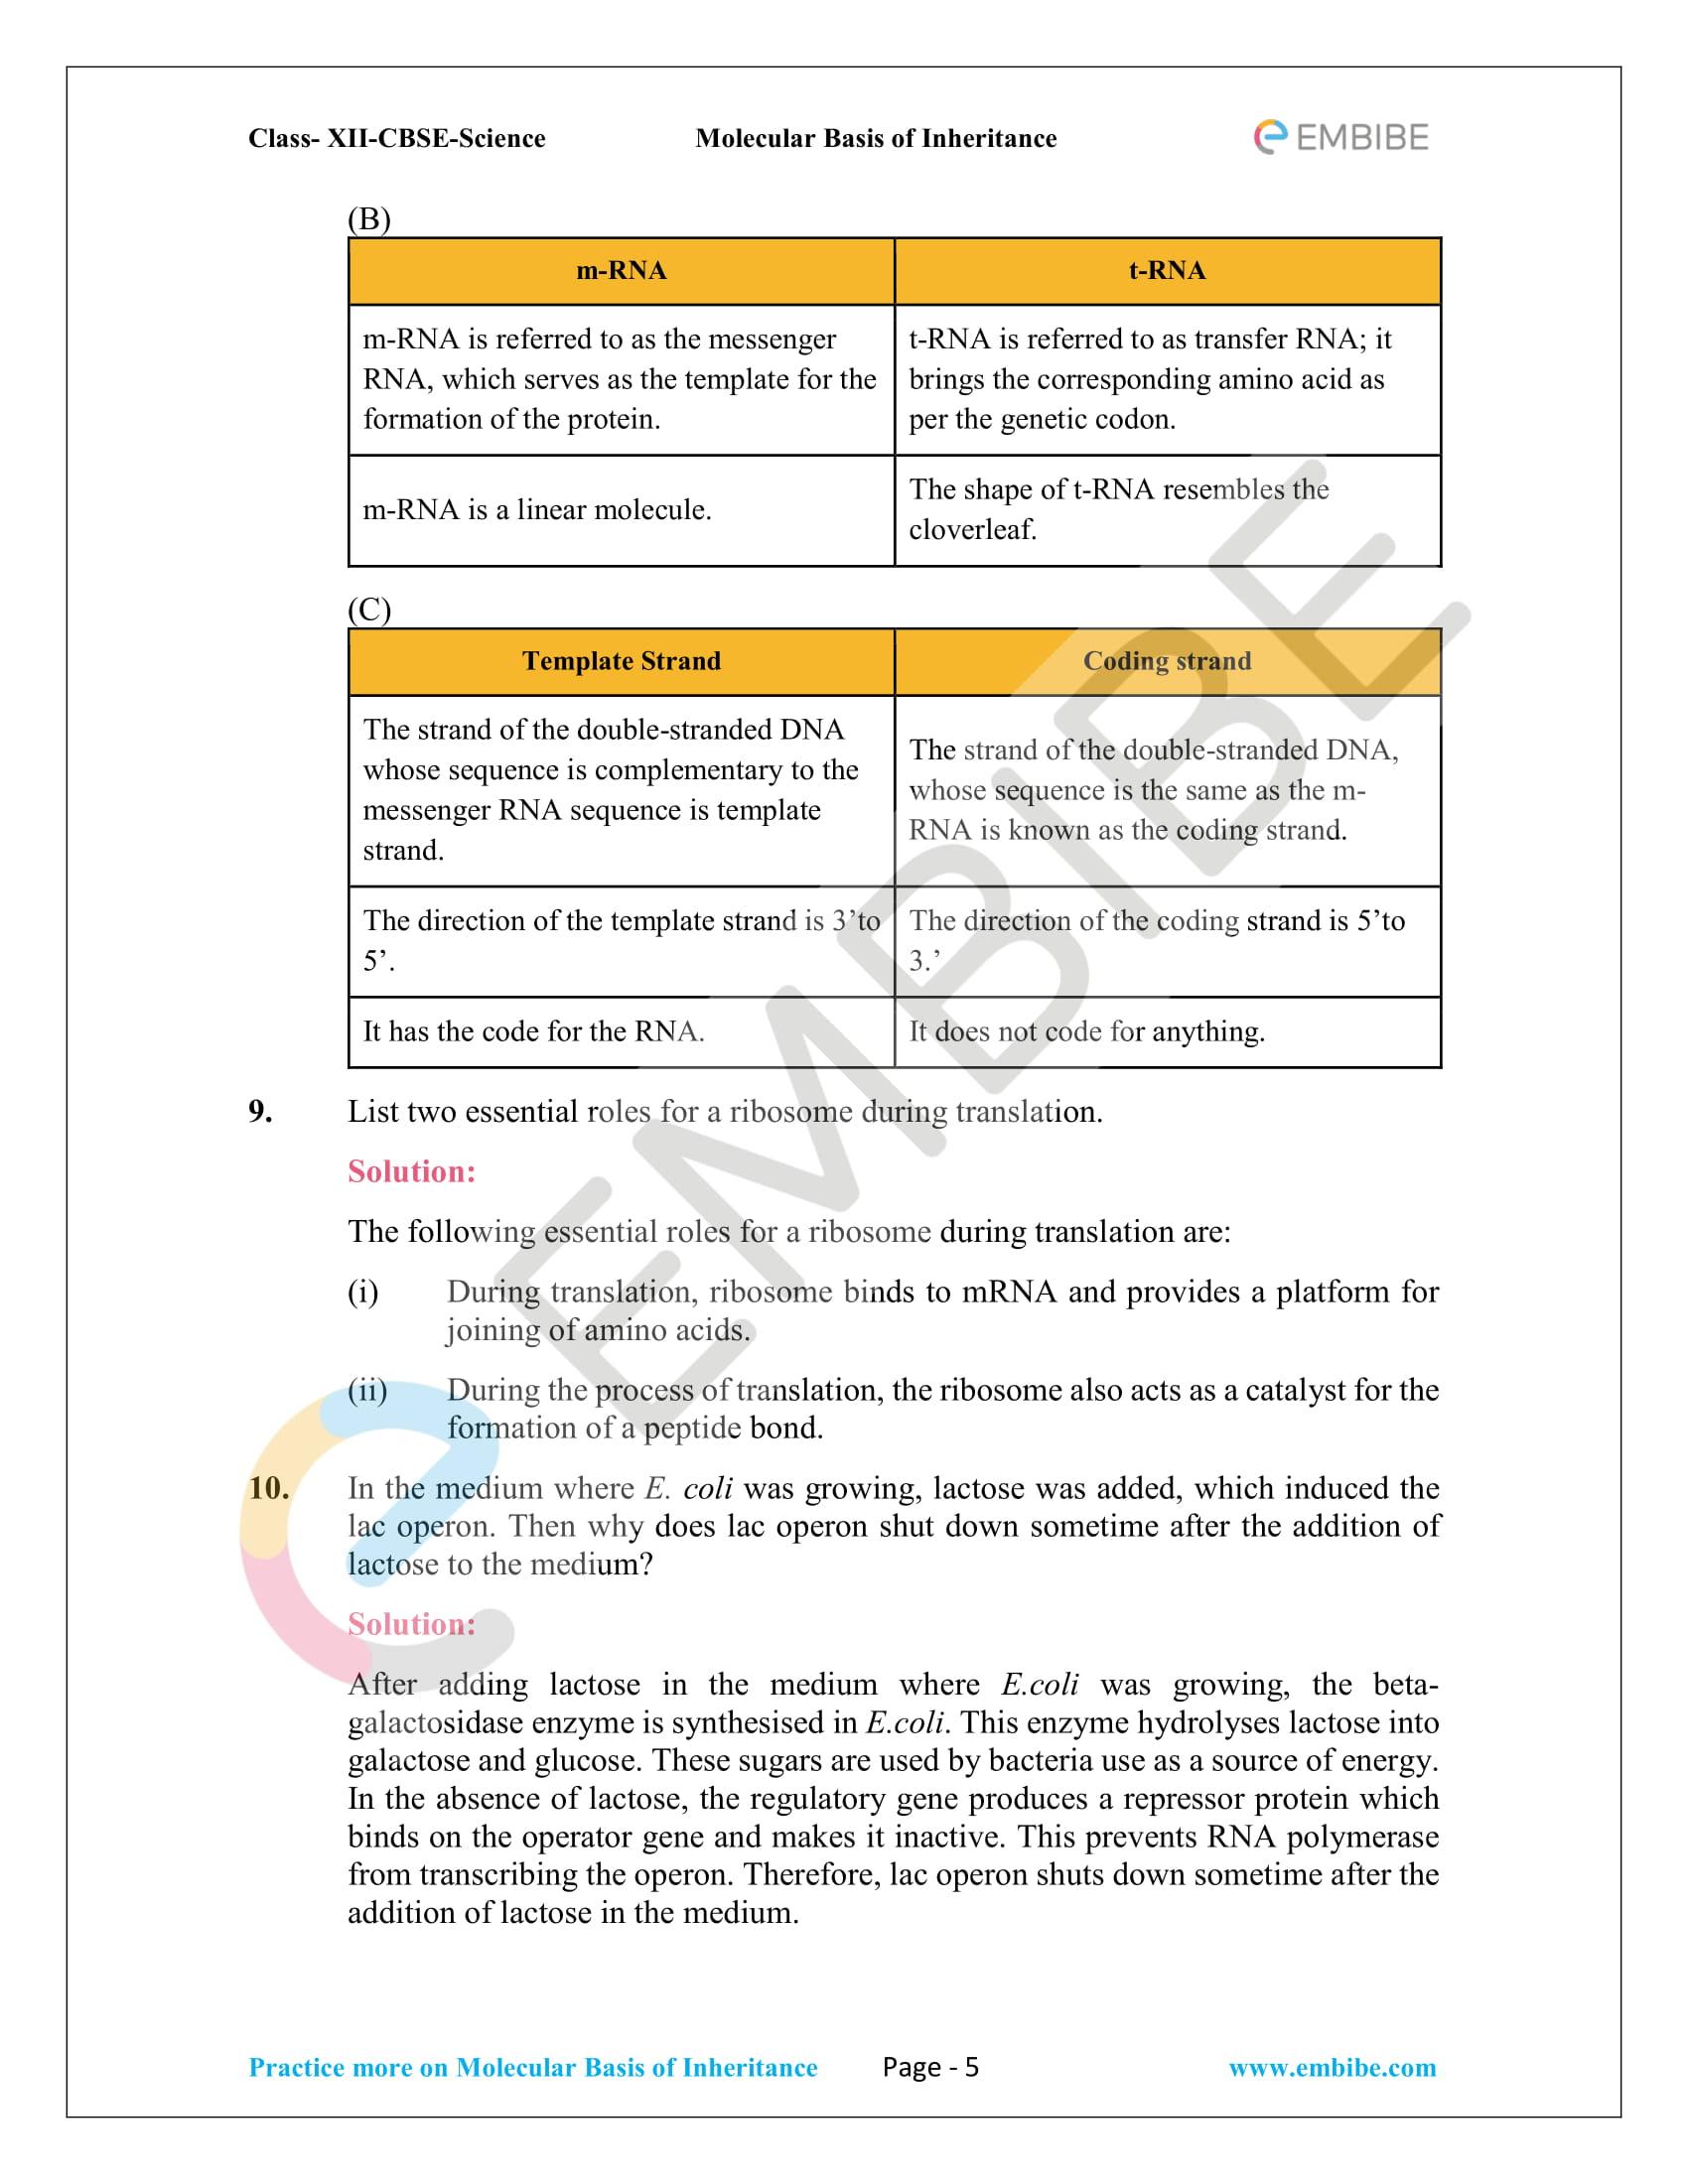 NCERT Solutions for Class 12 Biology Chapter 6: Molecular Basis Of Inheritance - 5